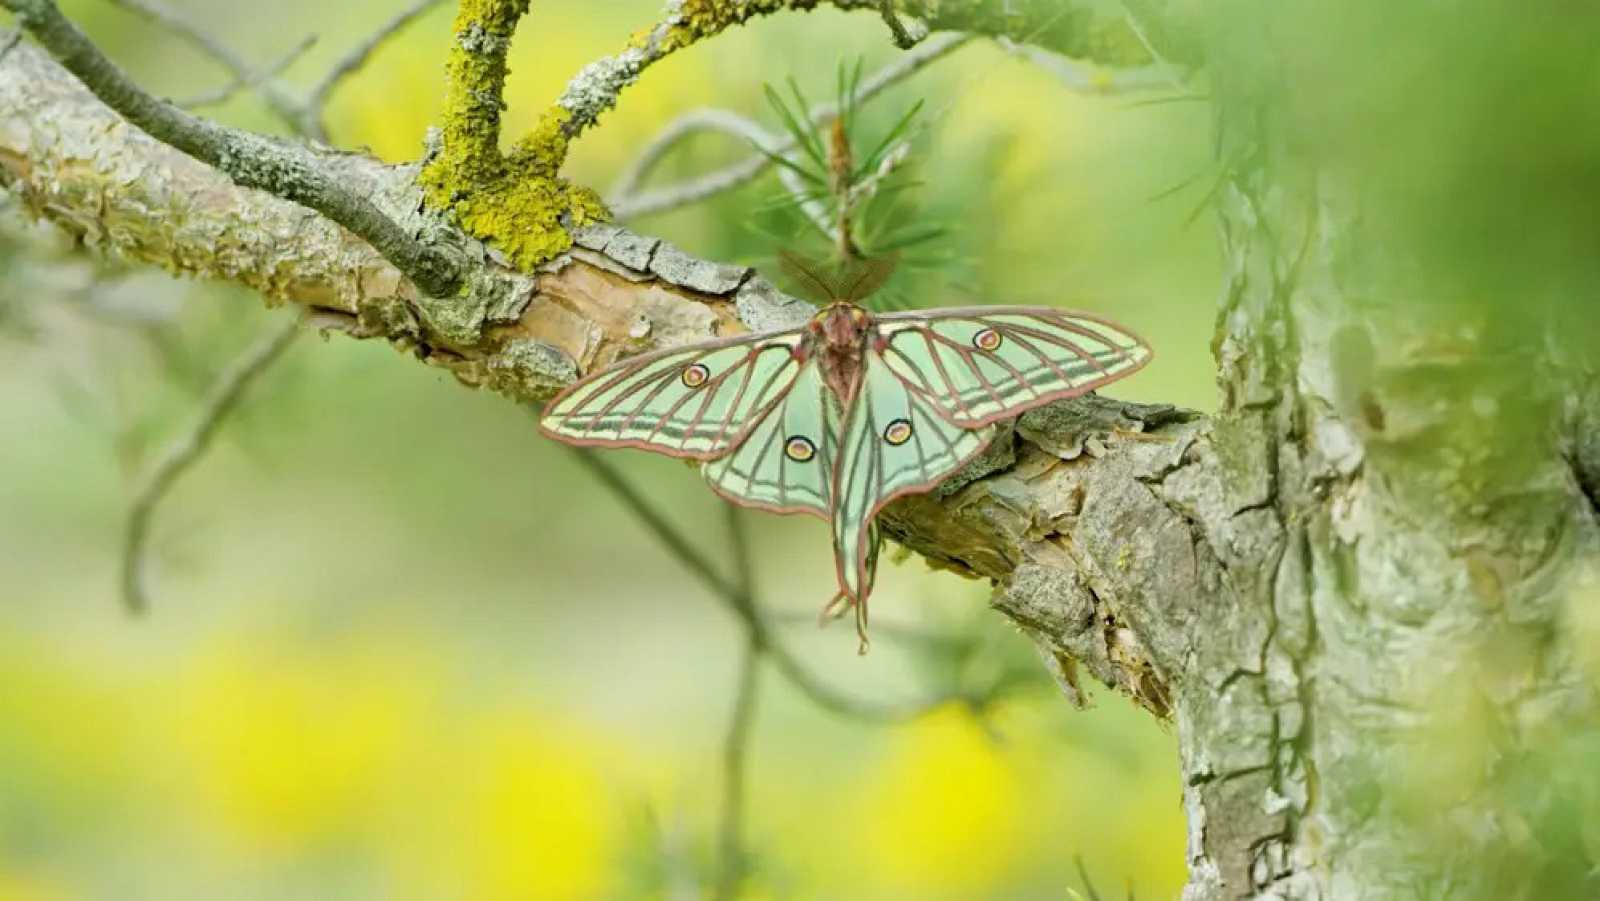 Hora América - 'Natura Bizia', documental sobre biodiversidad del País Vasco y Navarra - escuchar ahroa